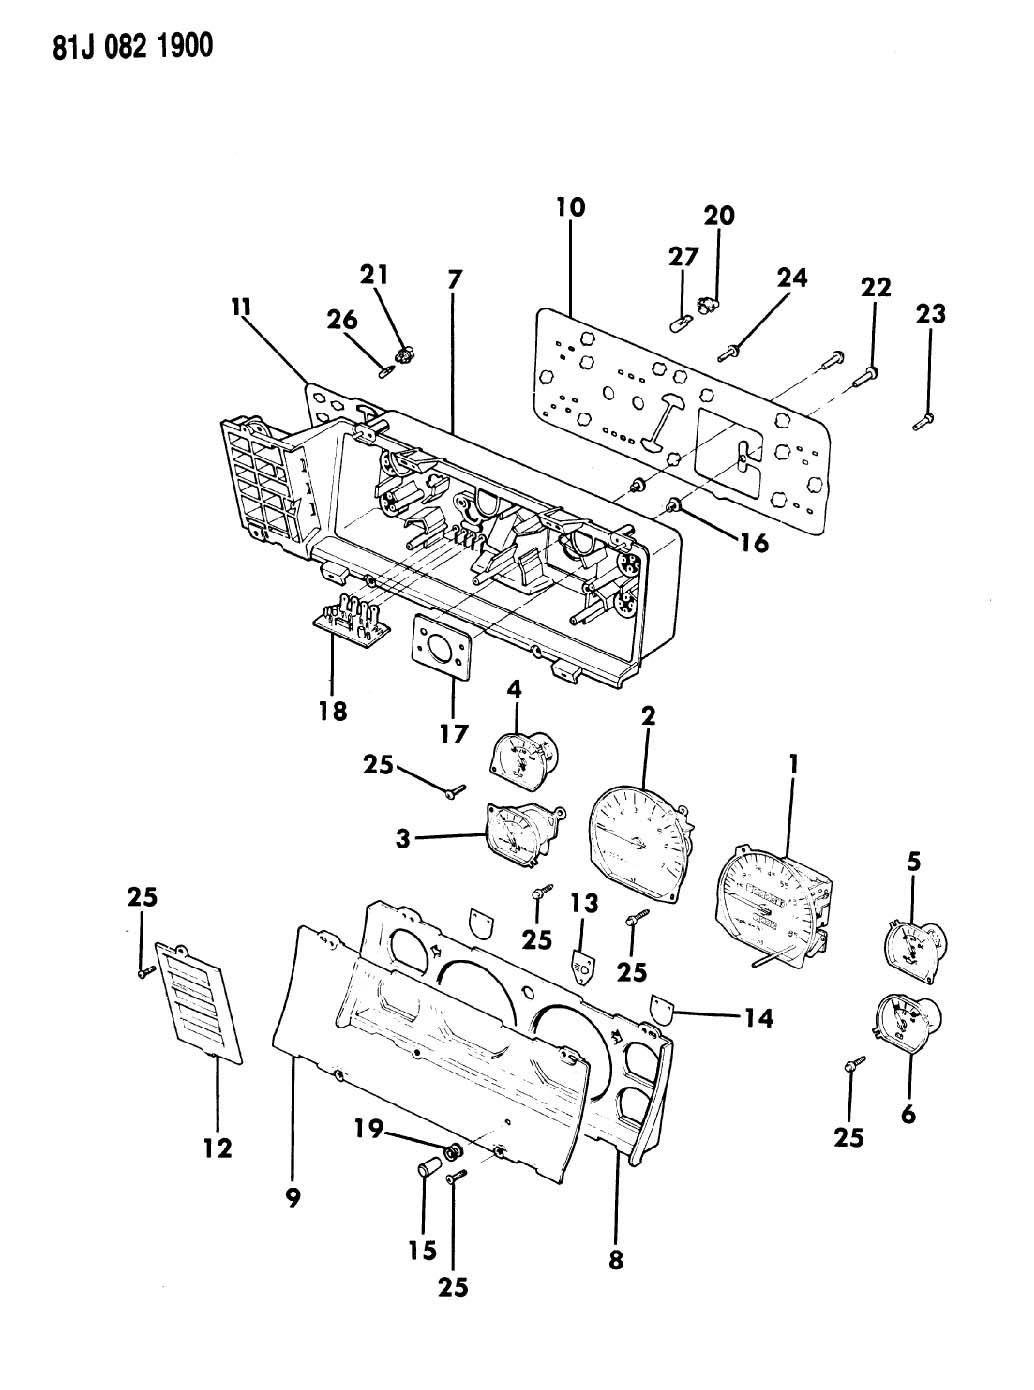 Jeep Cherokee Instrument Cluster With Gauges